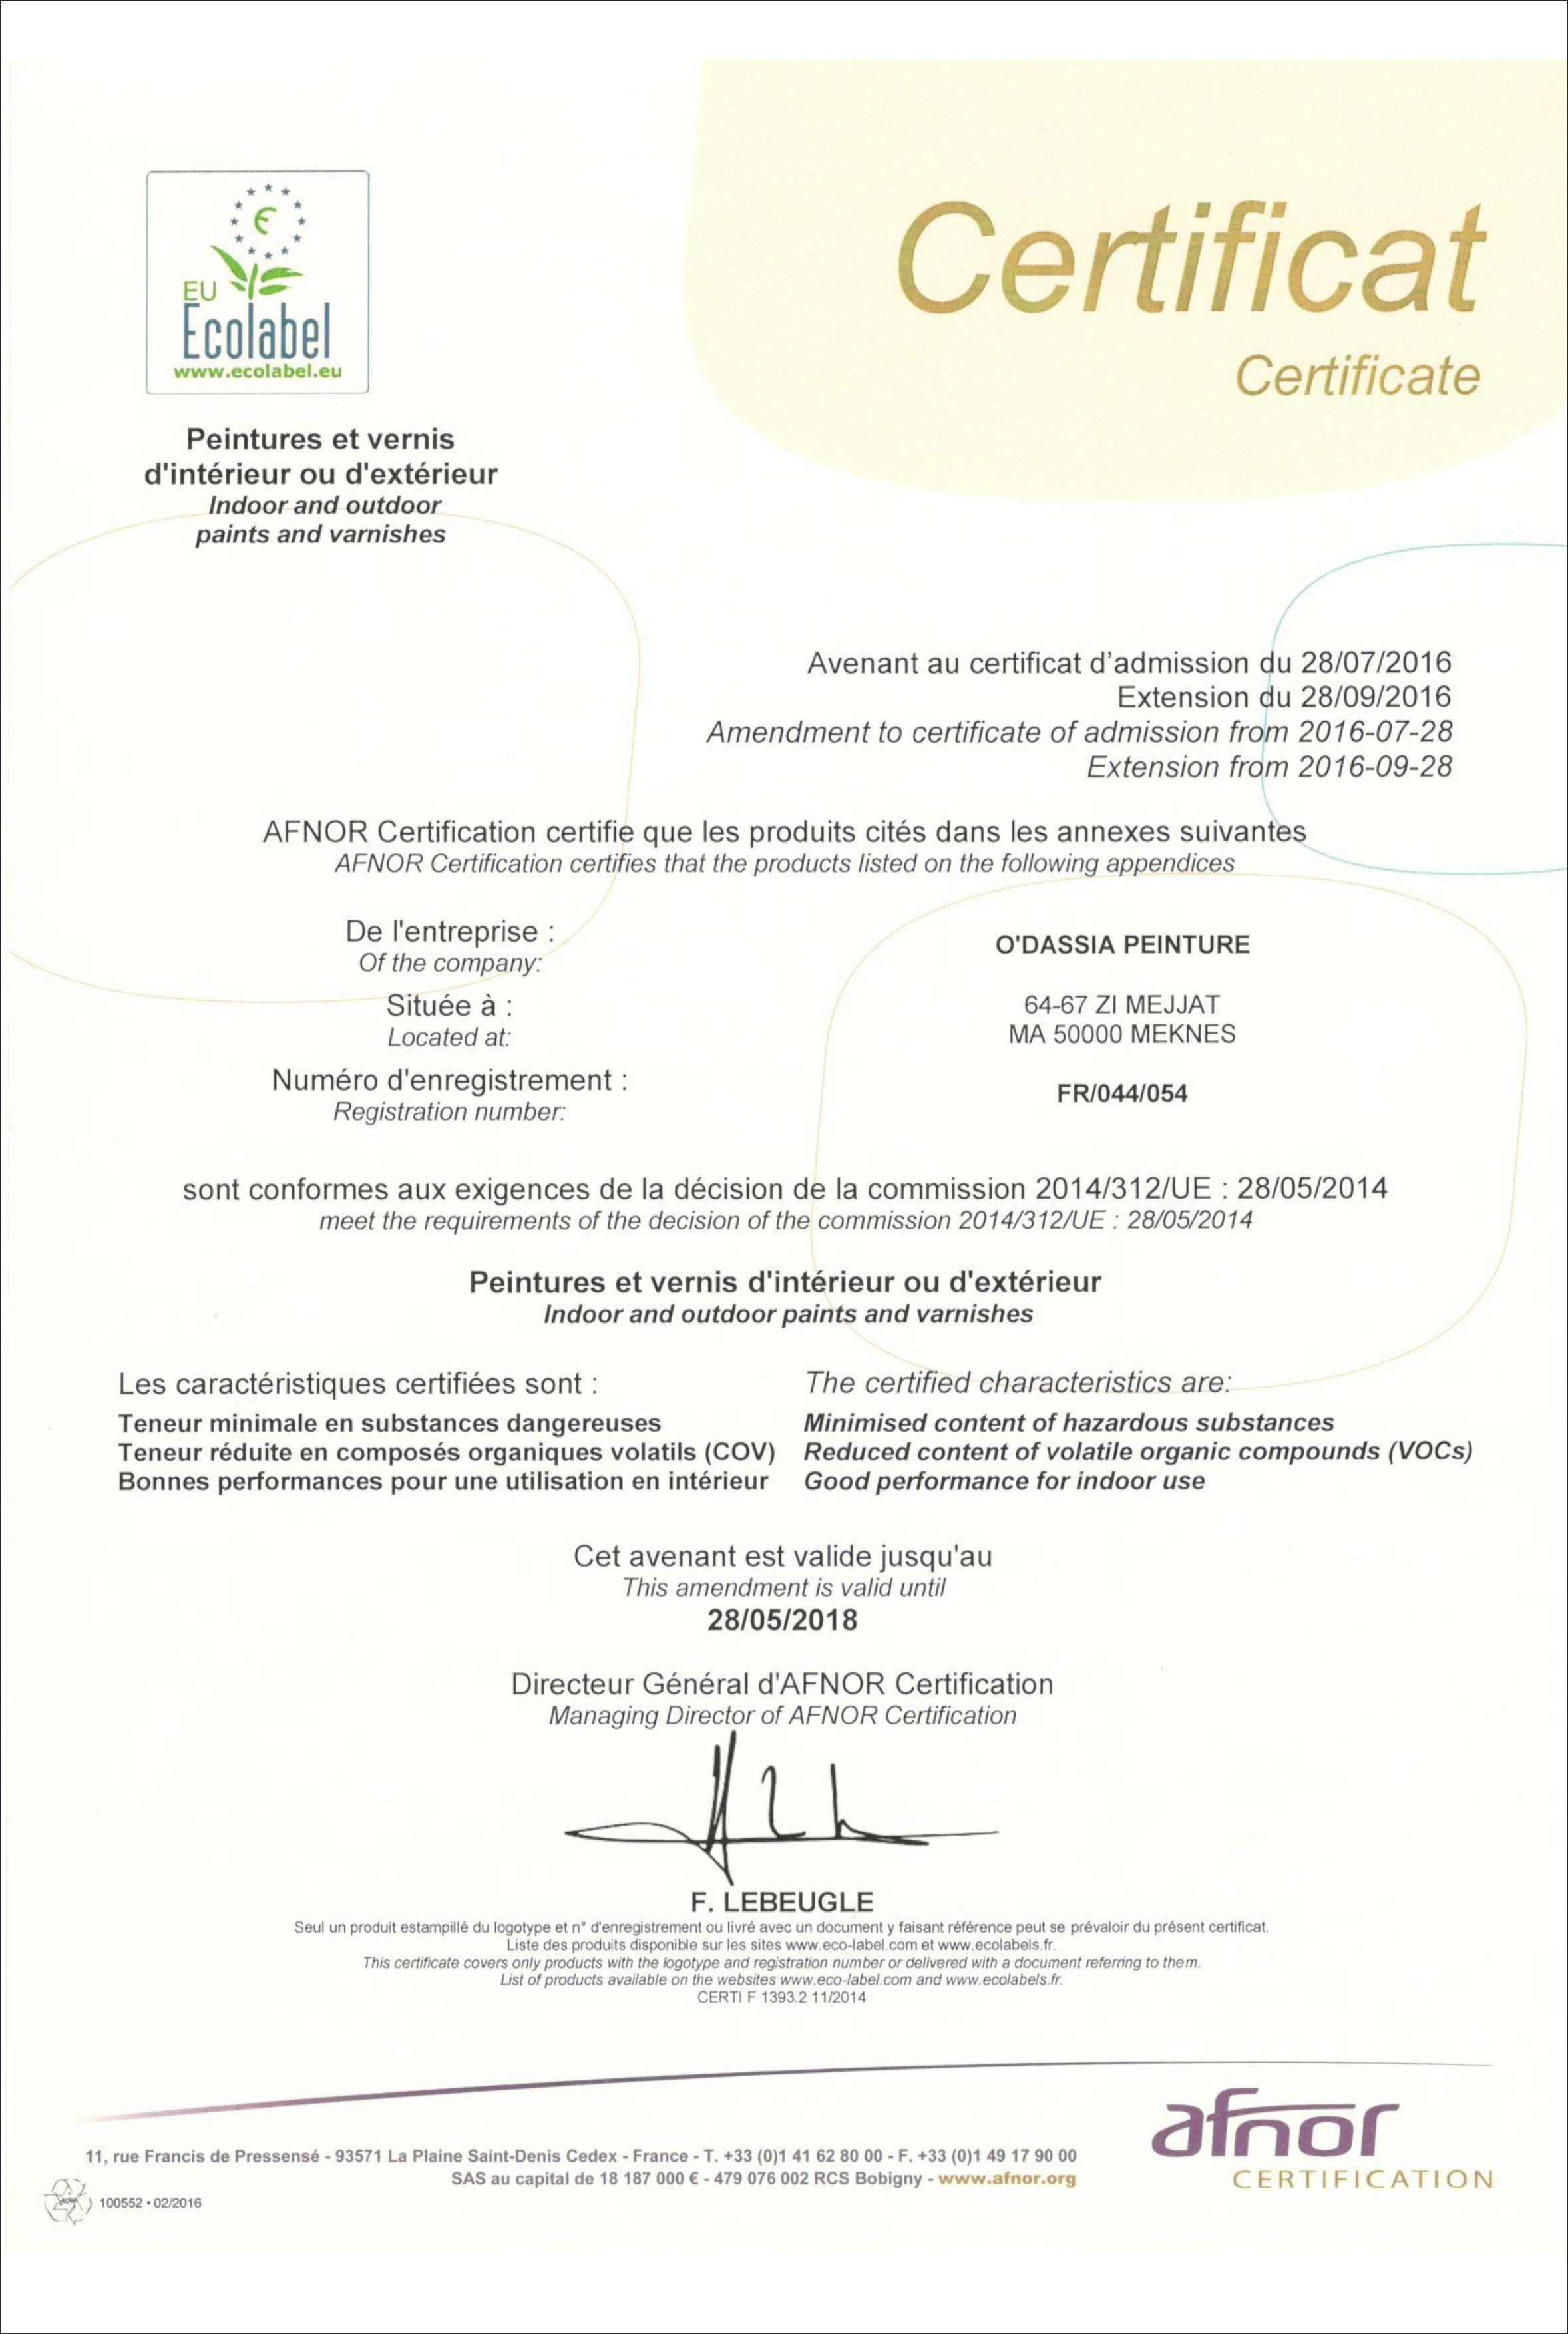 Certificat Ecolabel ODAMAT